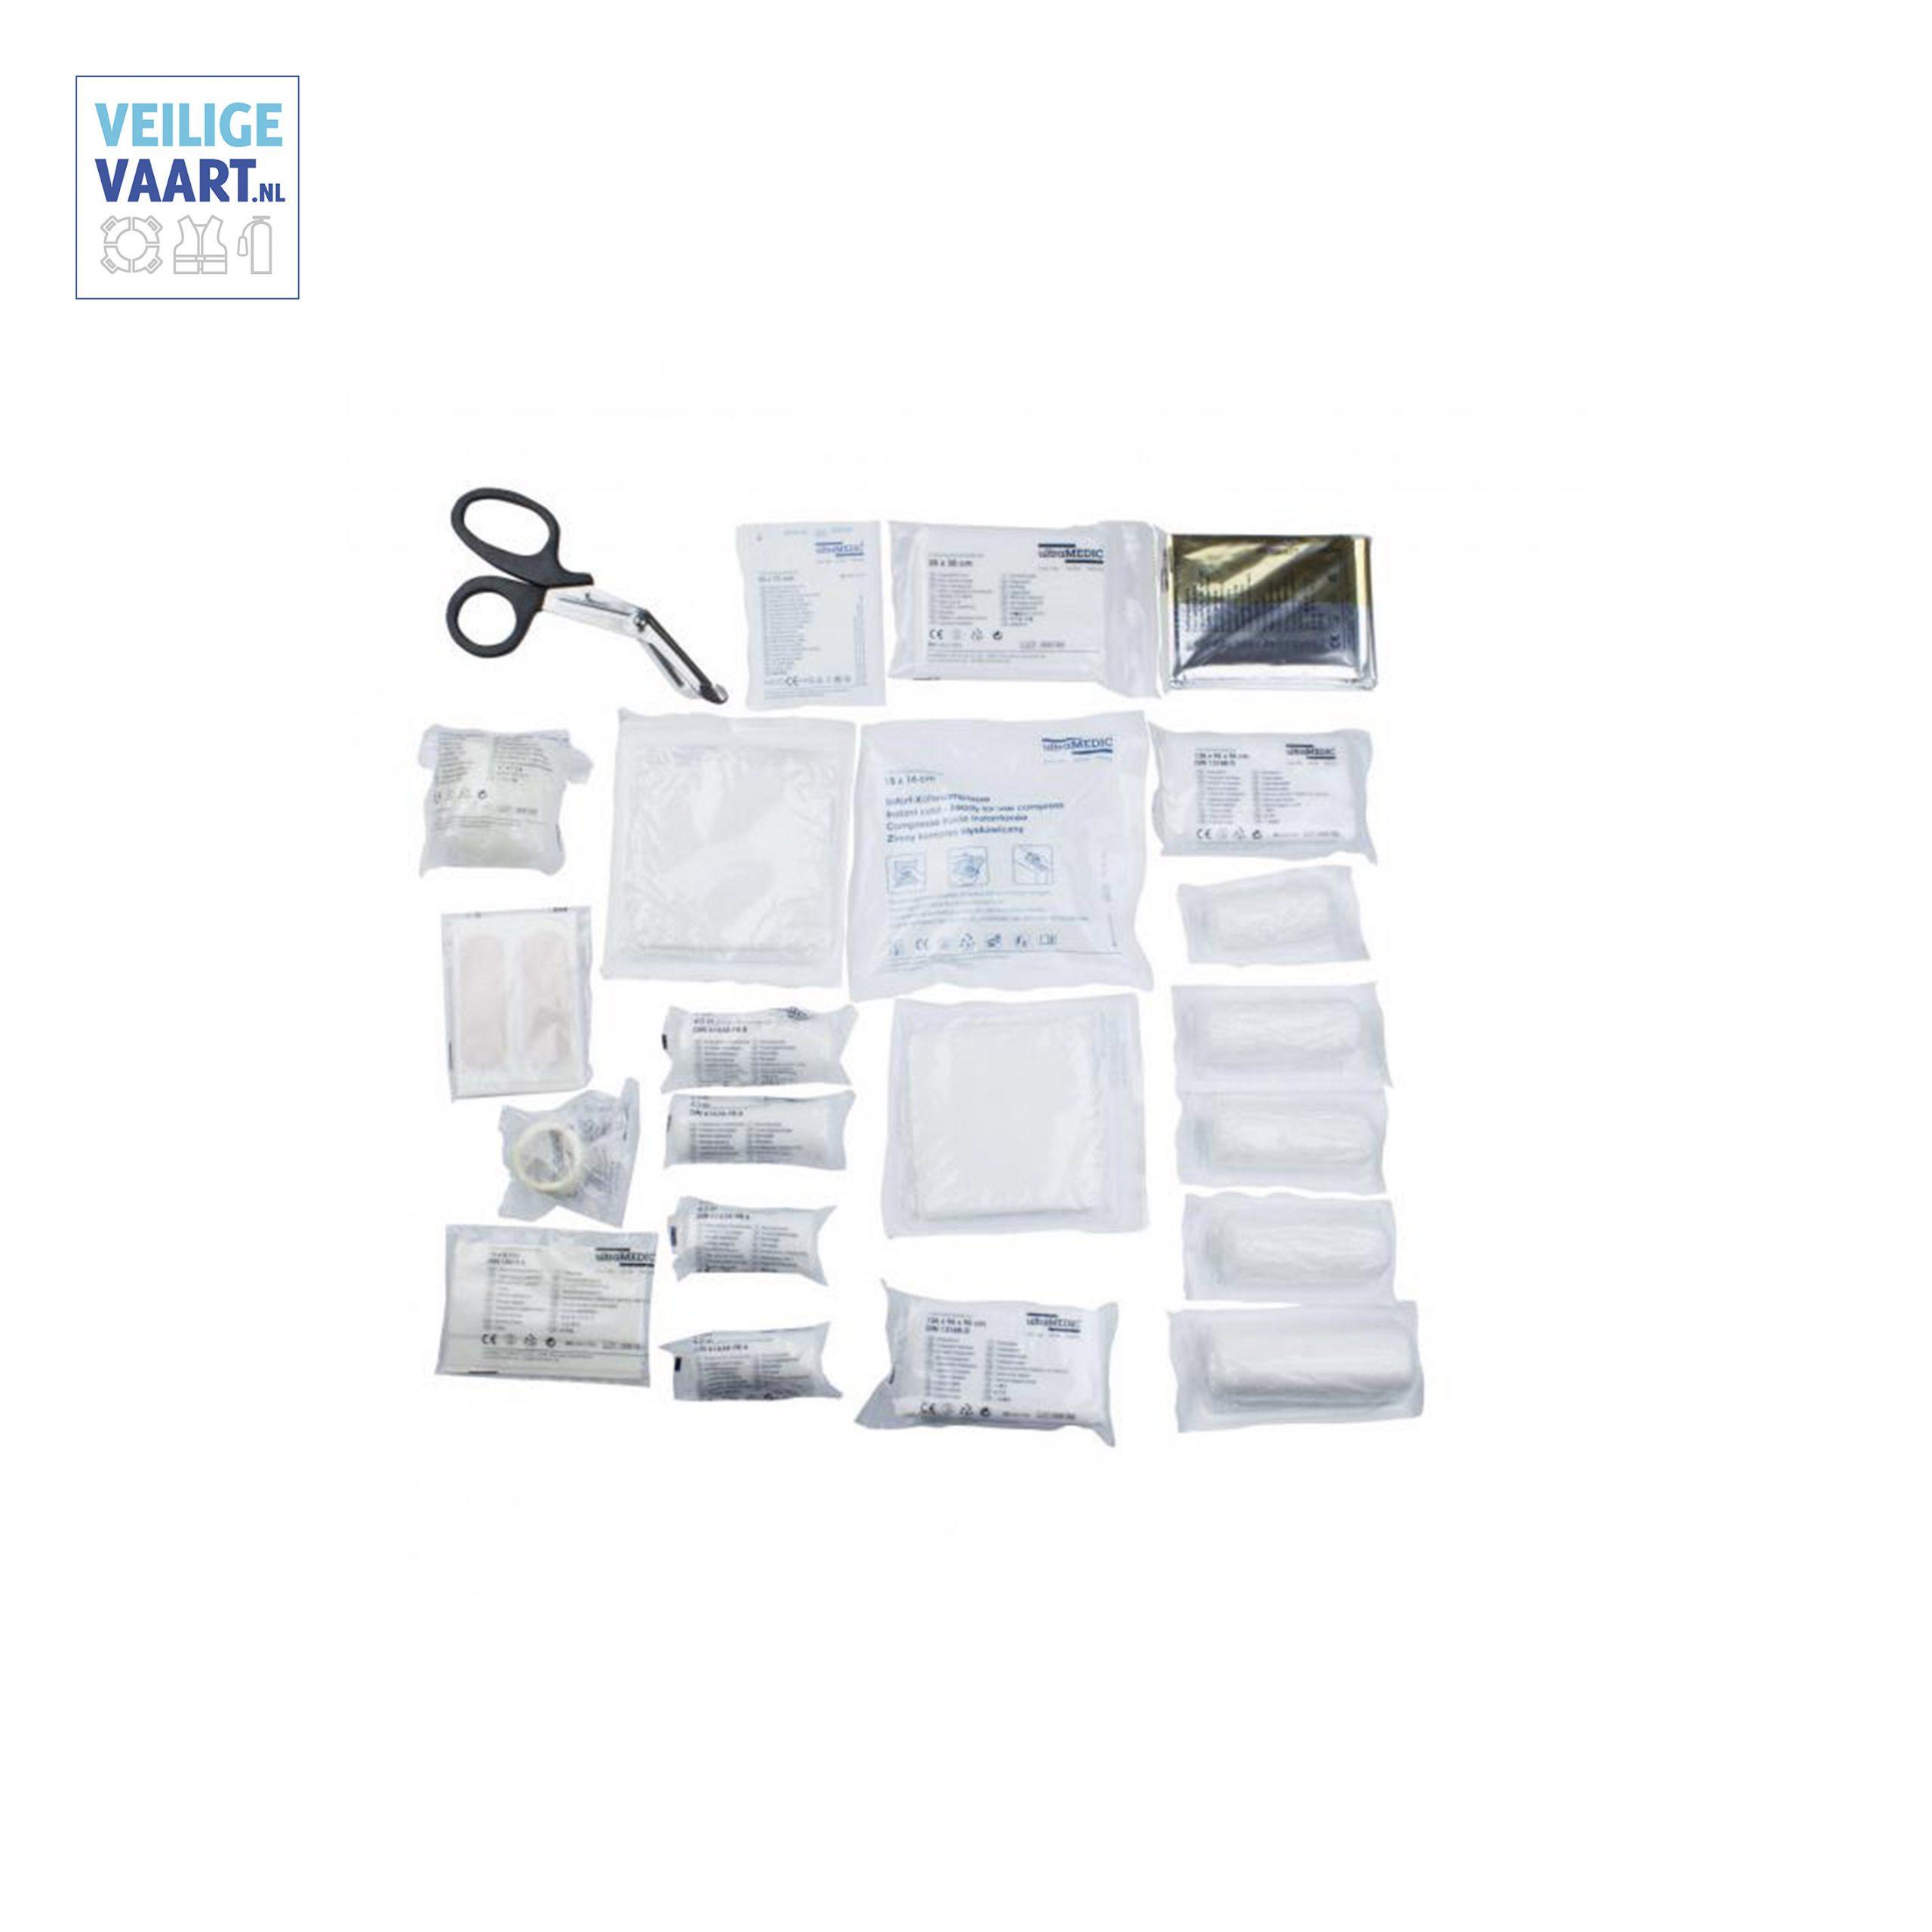 EHBO koffer inhoud DIN 13157